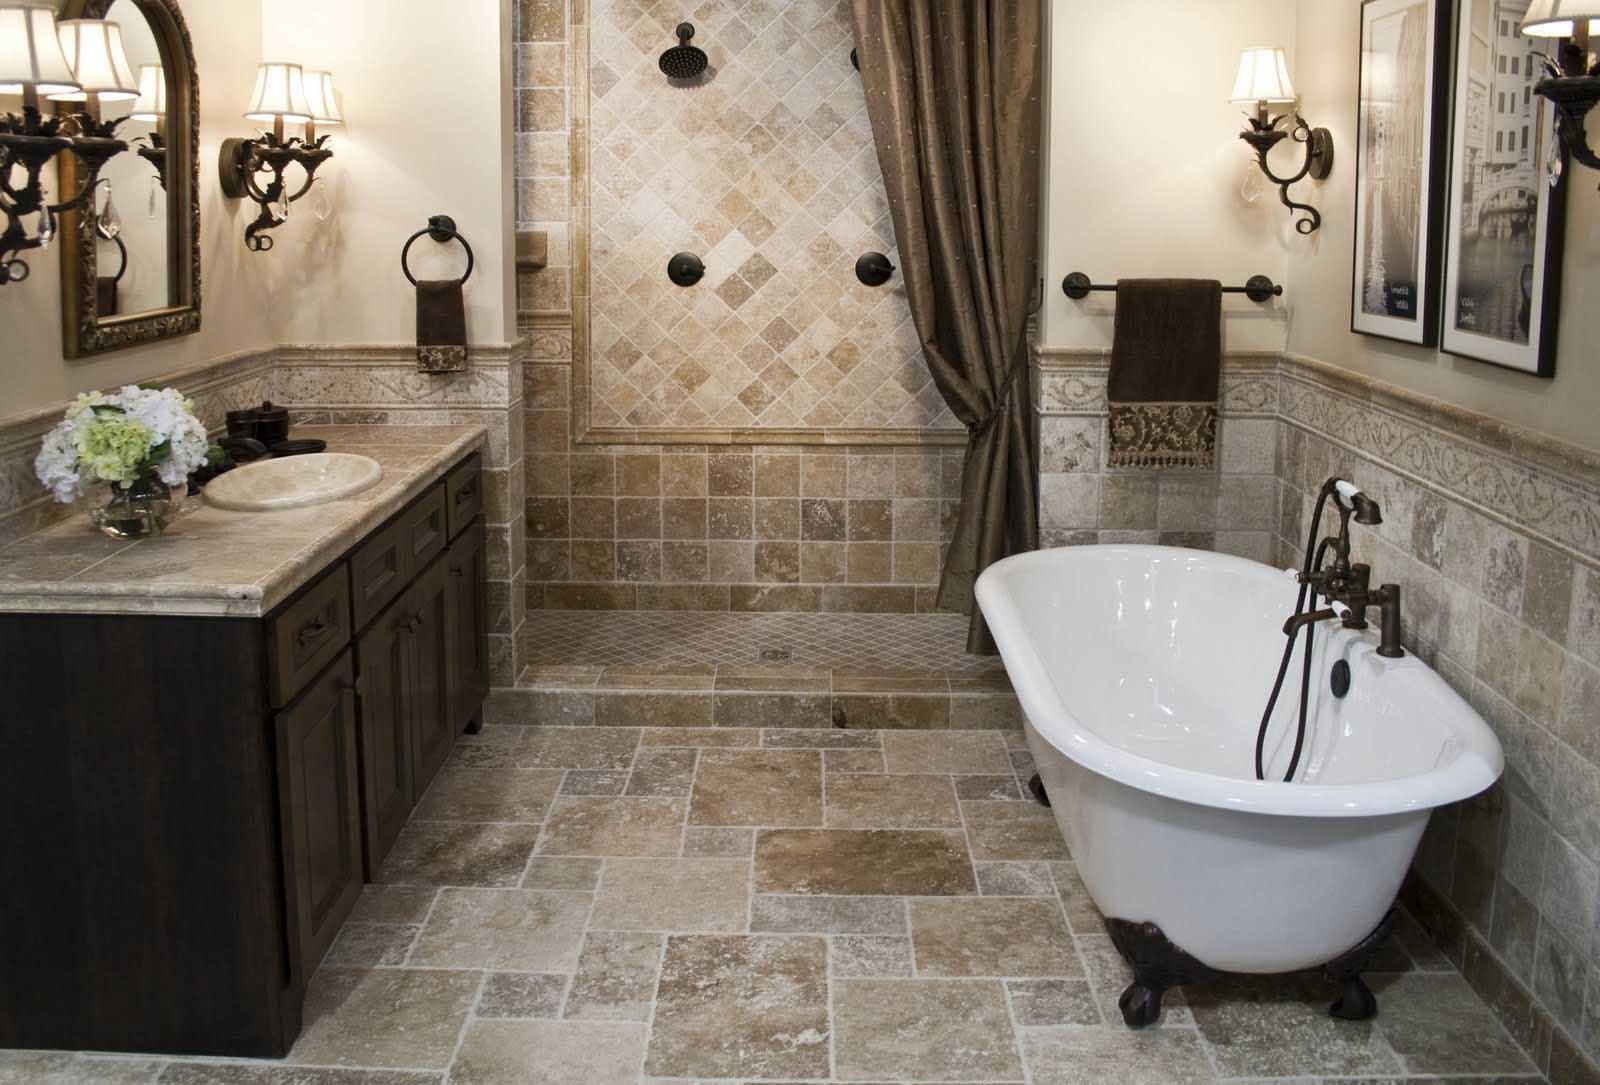 827_2_classic-small-bathroom-ideas.jpg